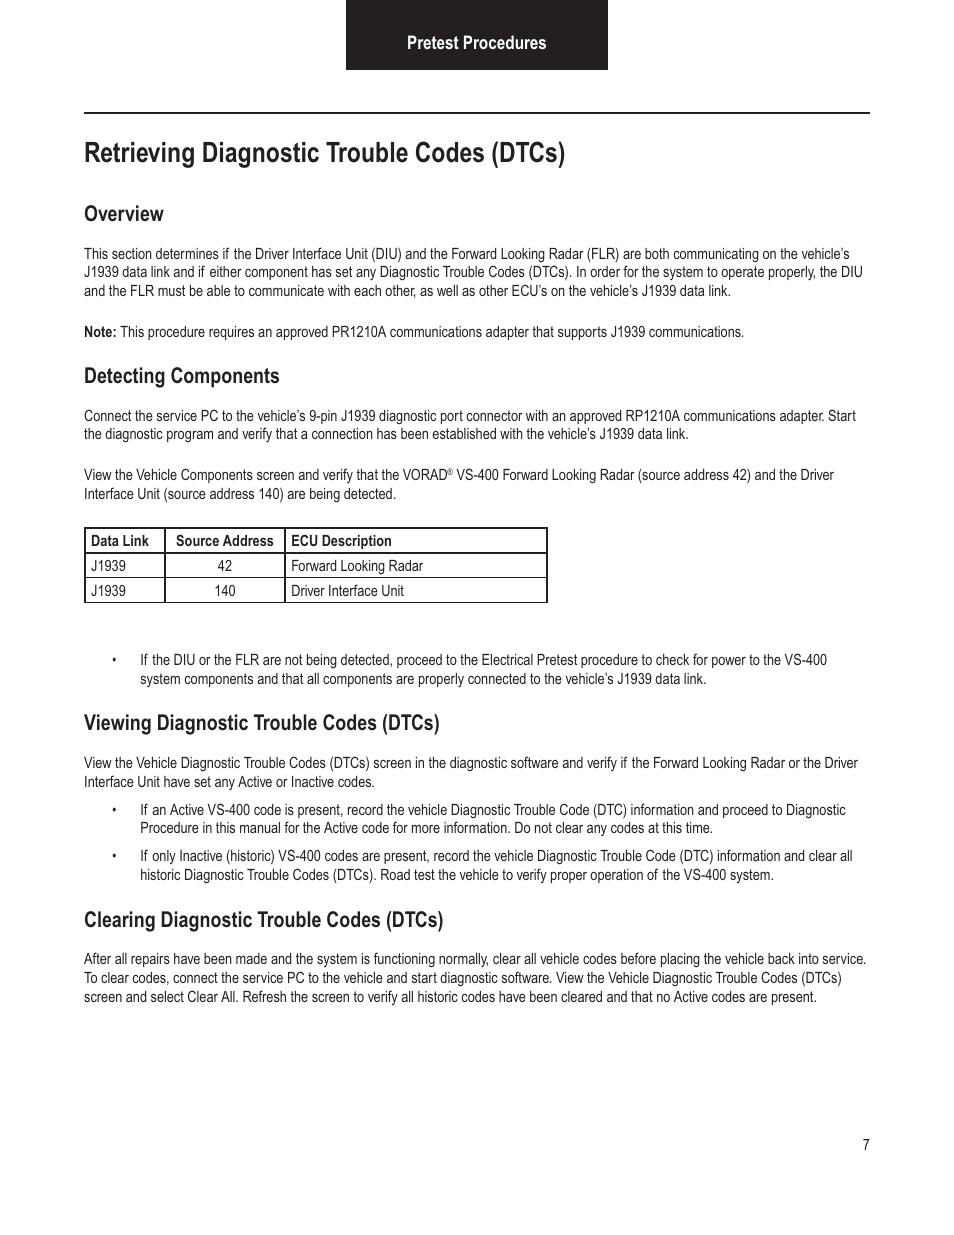 Retrieving diagnostic trouble codes (dtcs), Overview